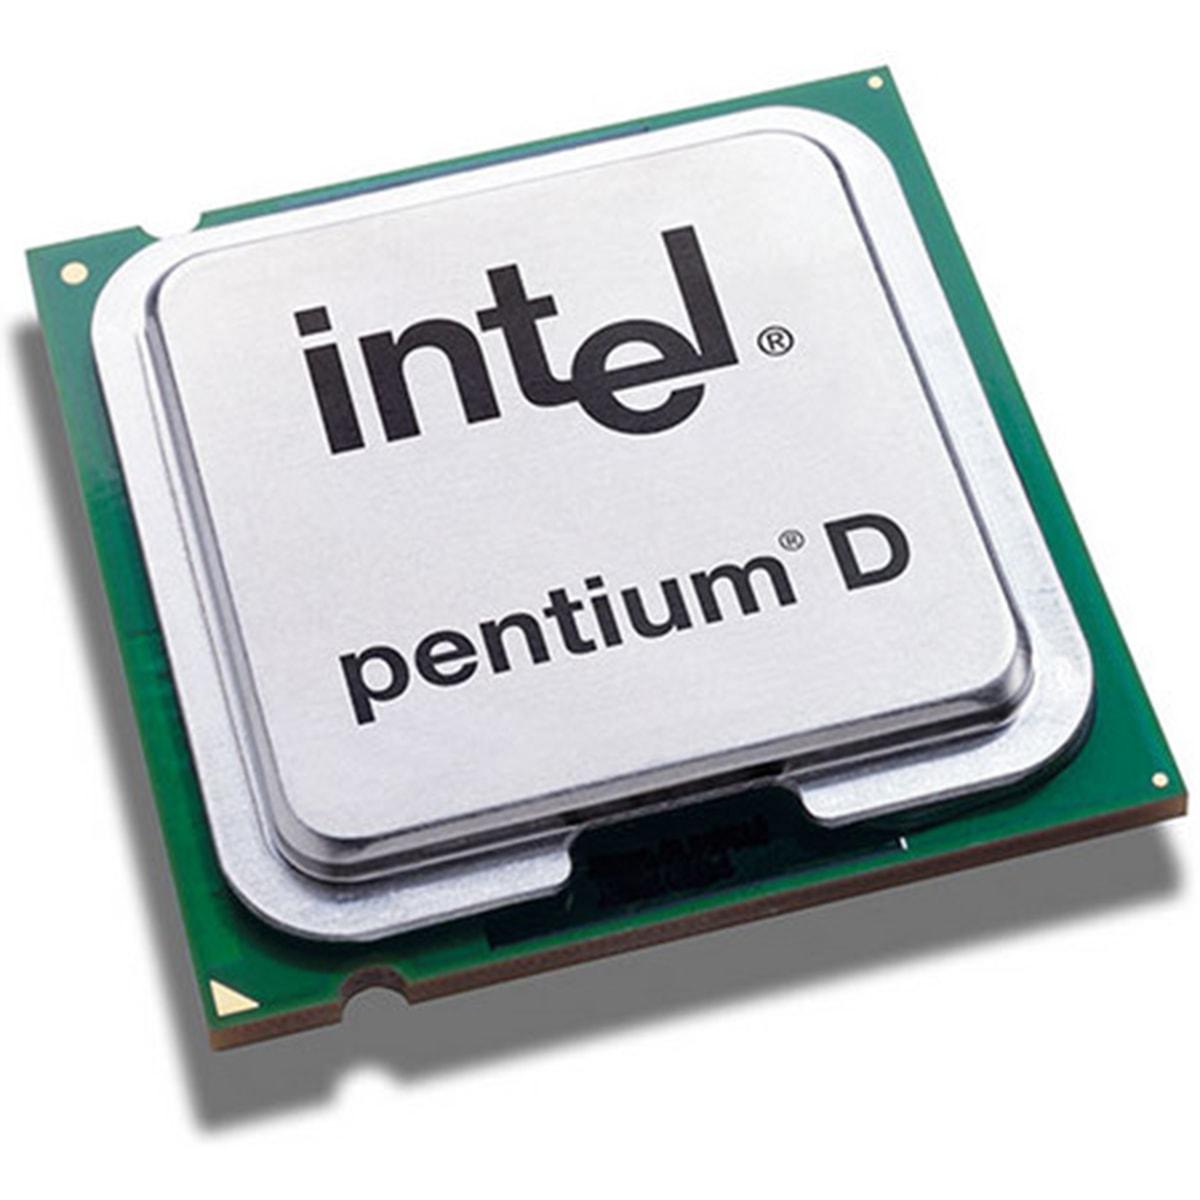 Processador Intel Pentium D 945 3,40Ghz 4M Cache 800MHz - Socket 775 - Seminovo